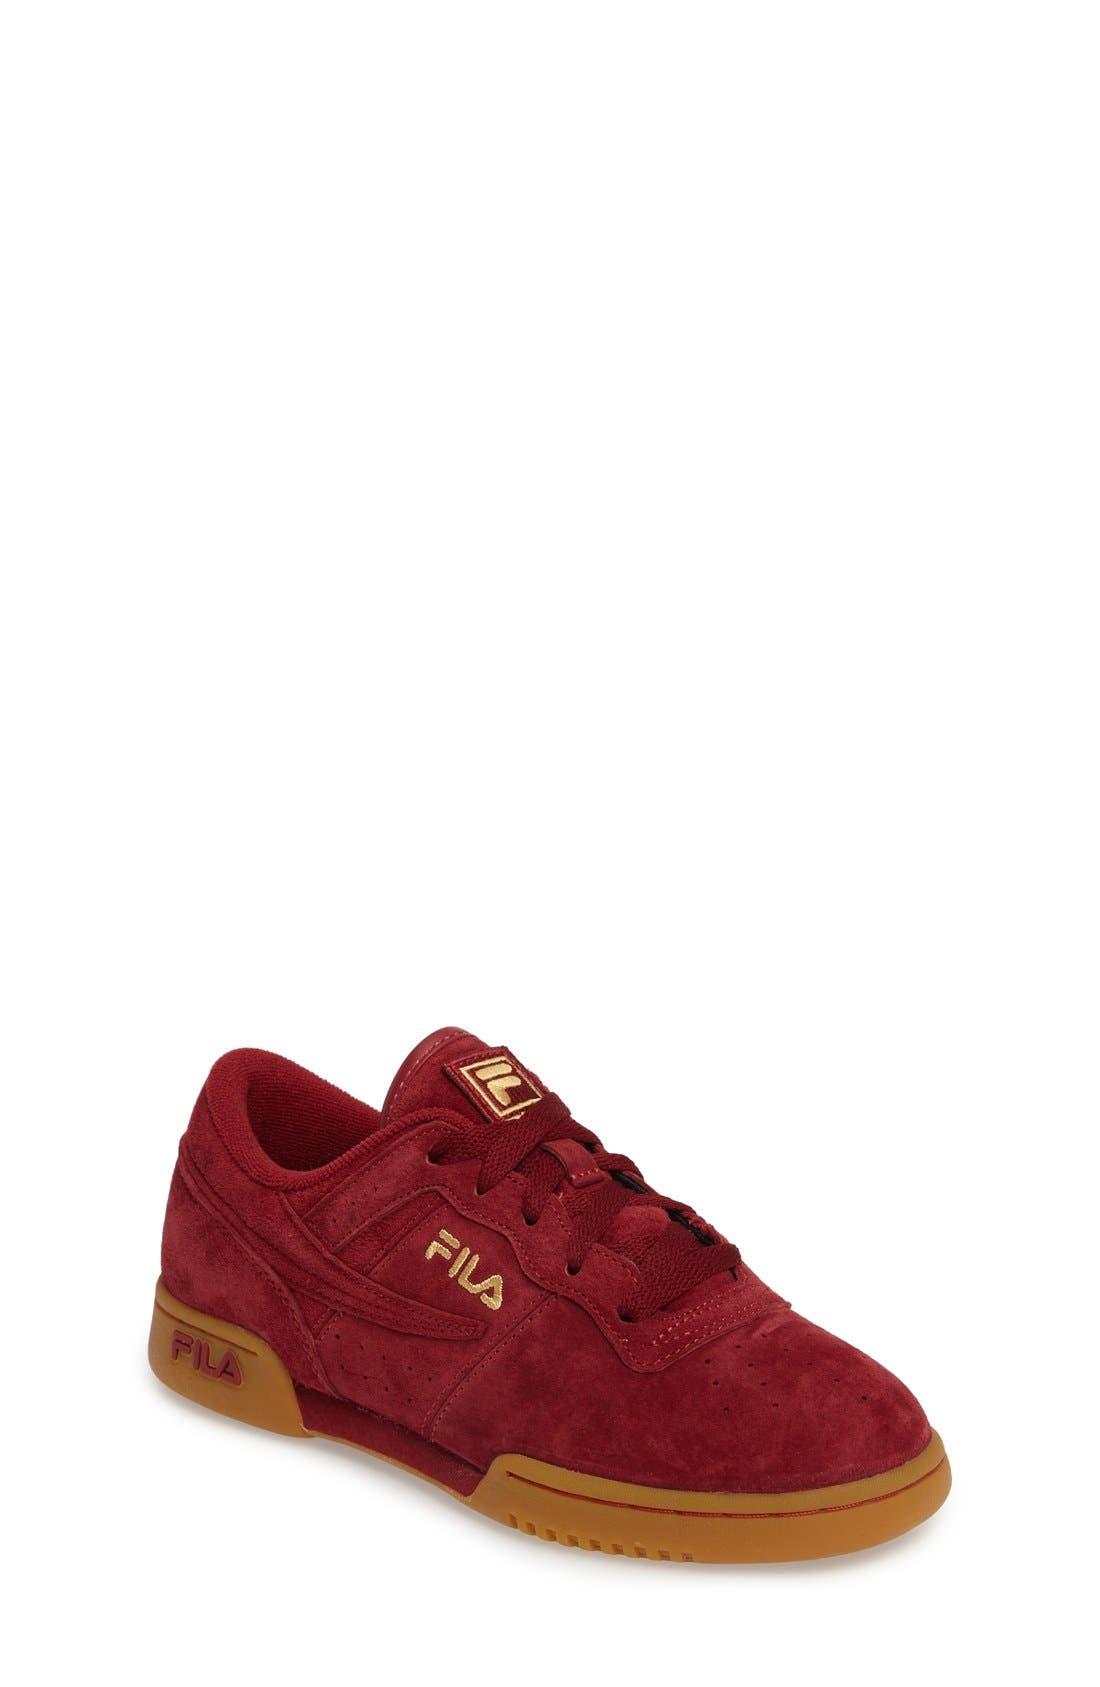 Heritage Sneaker,                         Main,                         color, Biking Red Suede